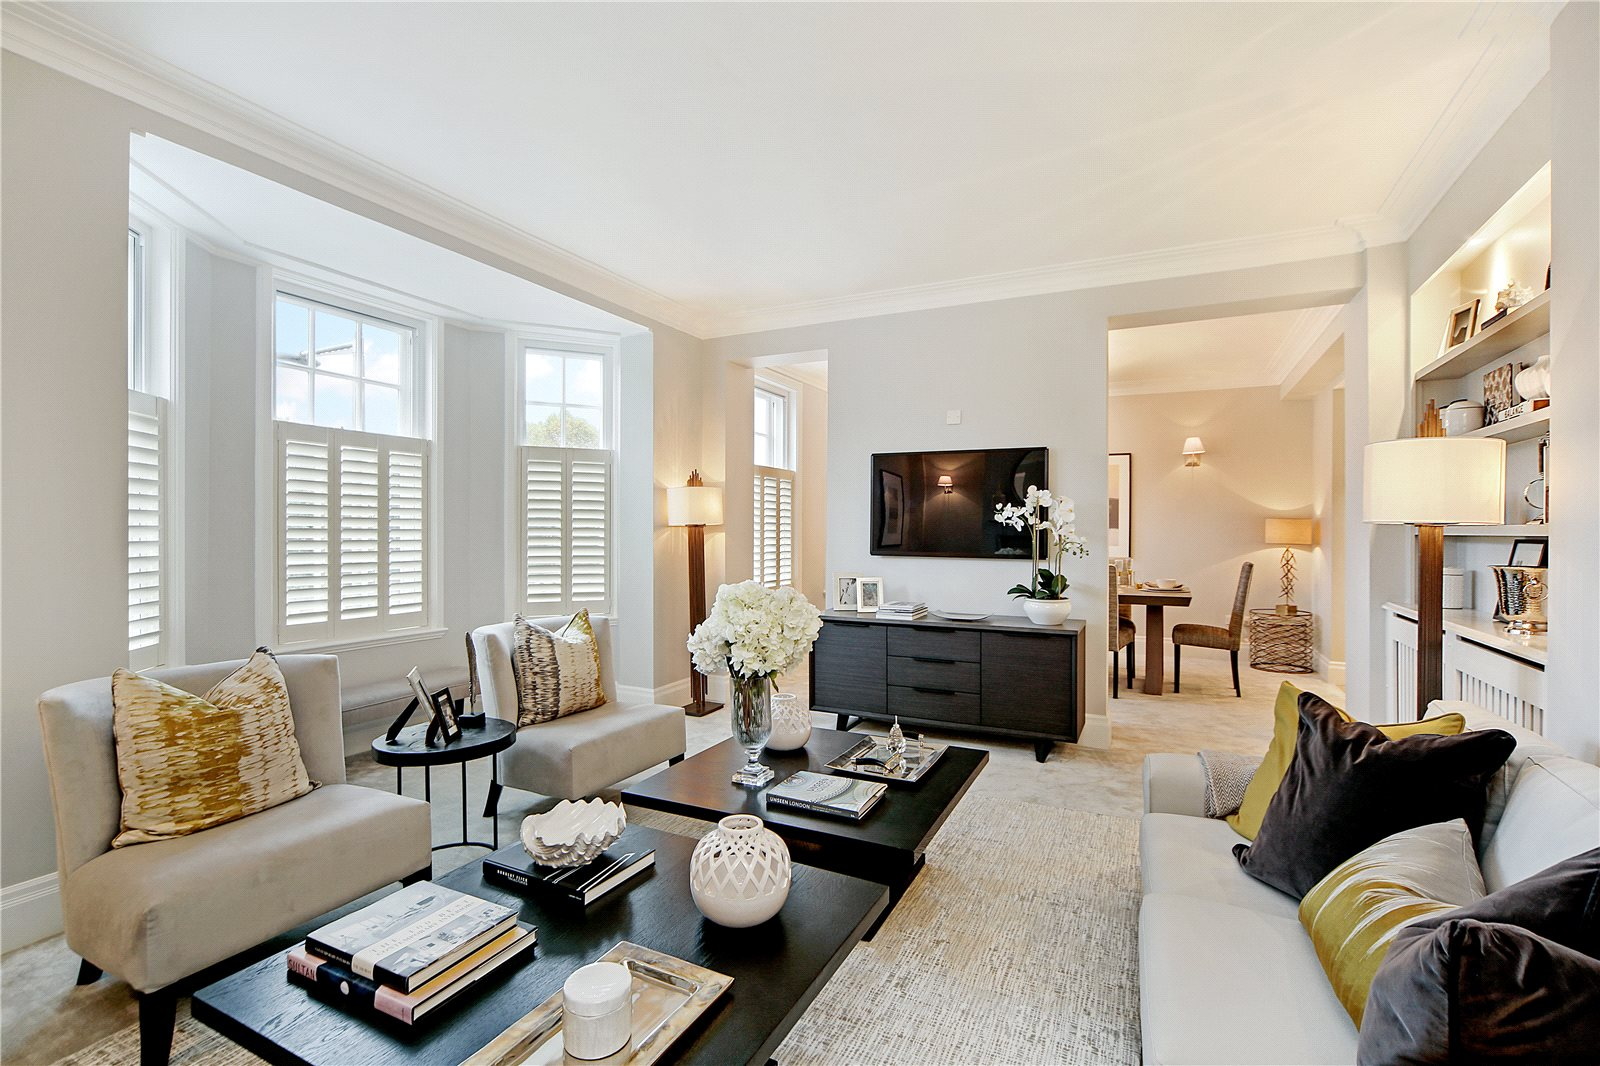 公寓 为 销售 在 Malvern Court, Onslow Square, South Kensington, London, SW7 South Kensington, London, 英格兰